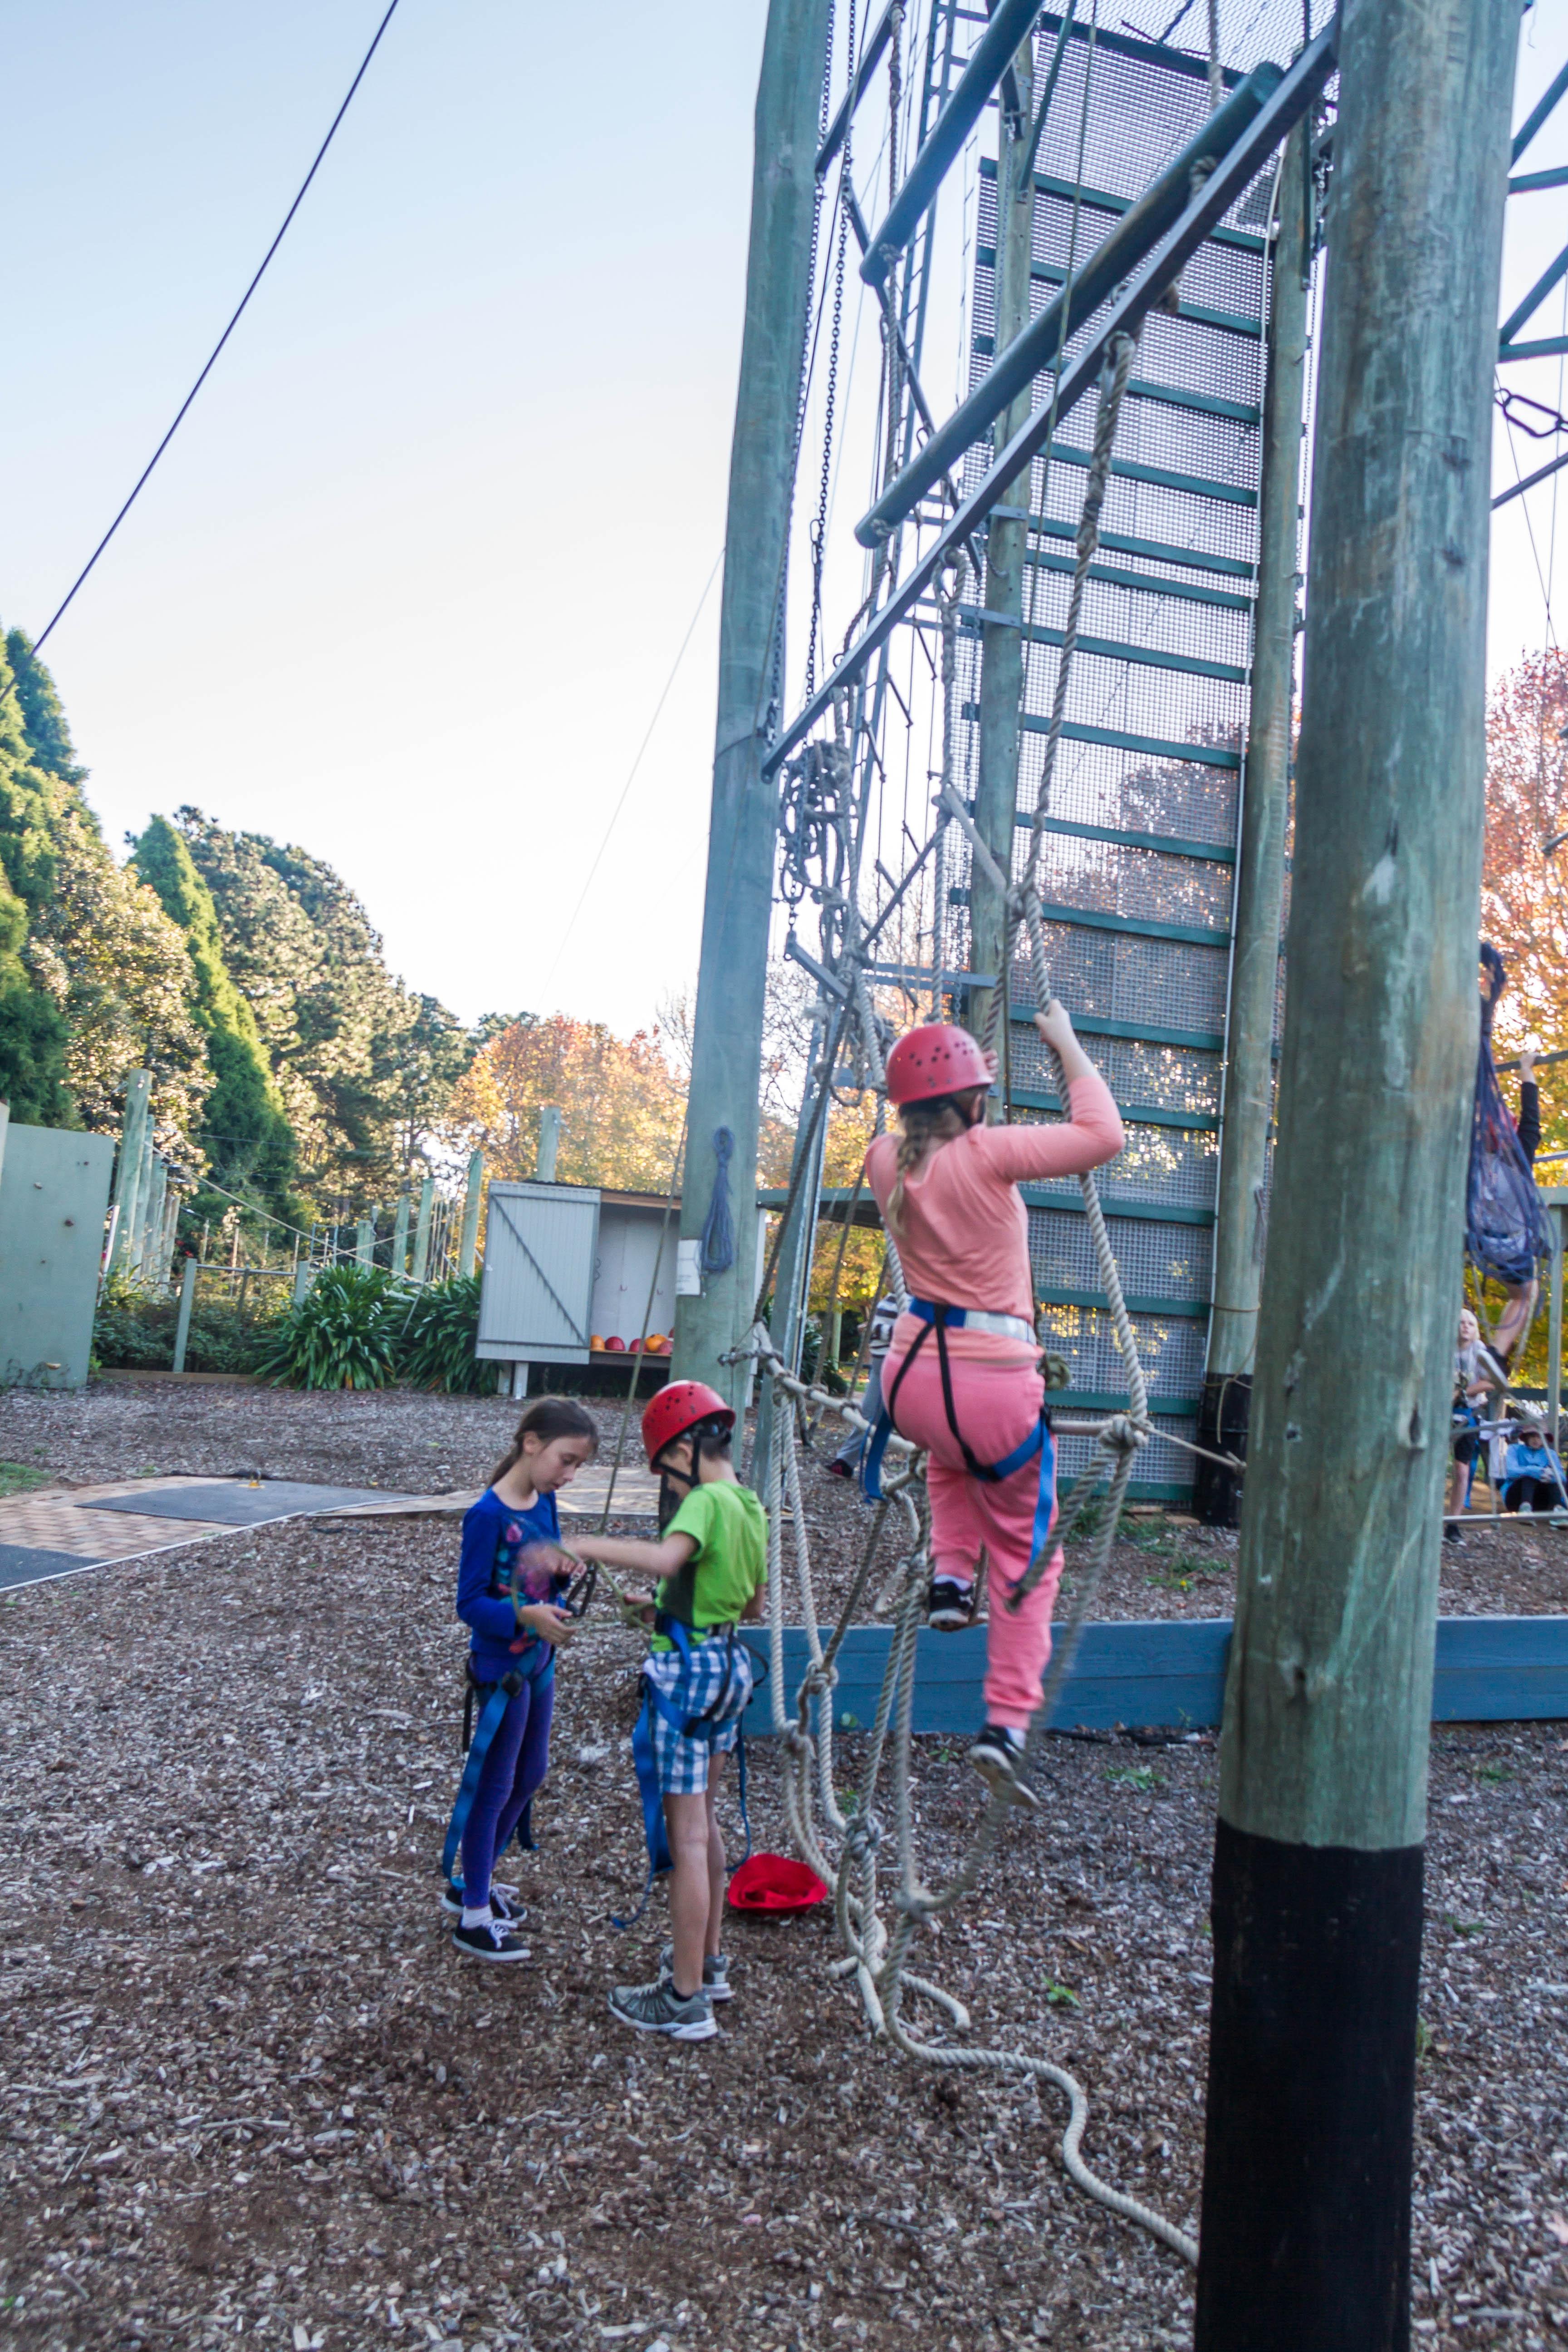 Giant's Playground